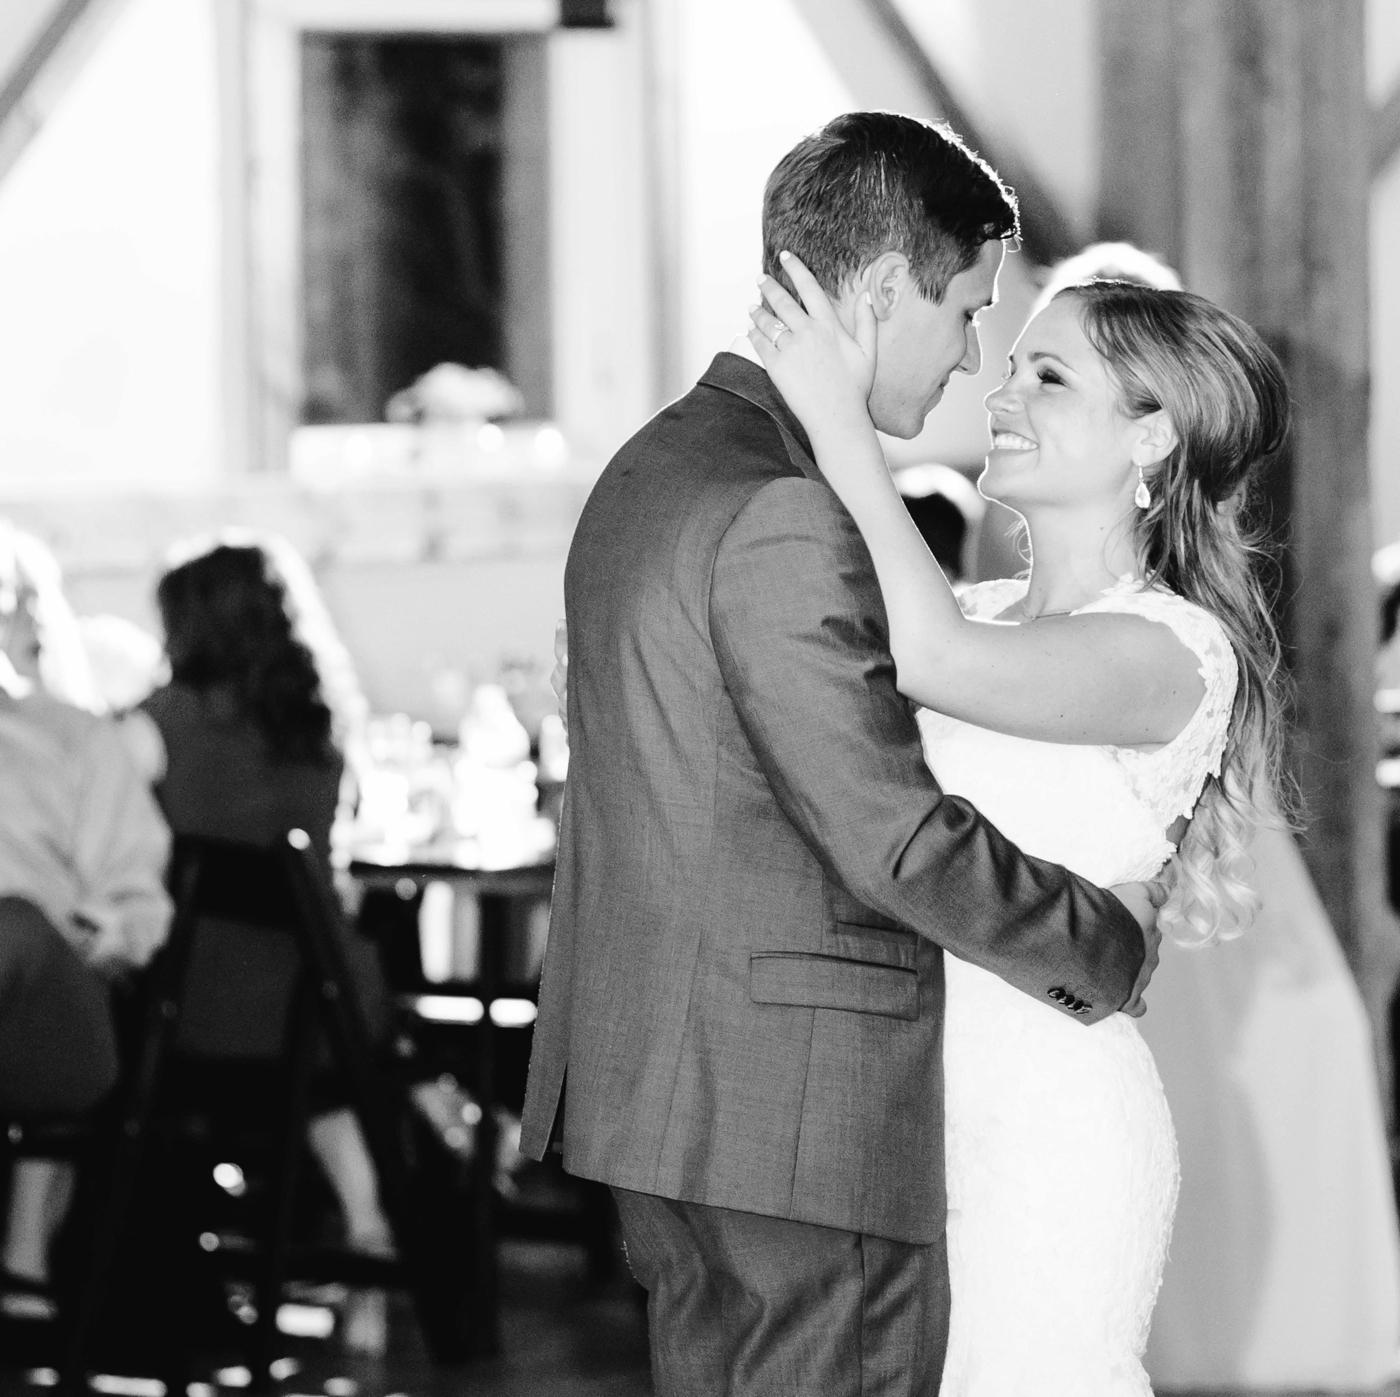 chicago-fine-art-wedding-photography-chiapetta45